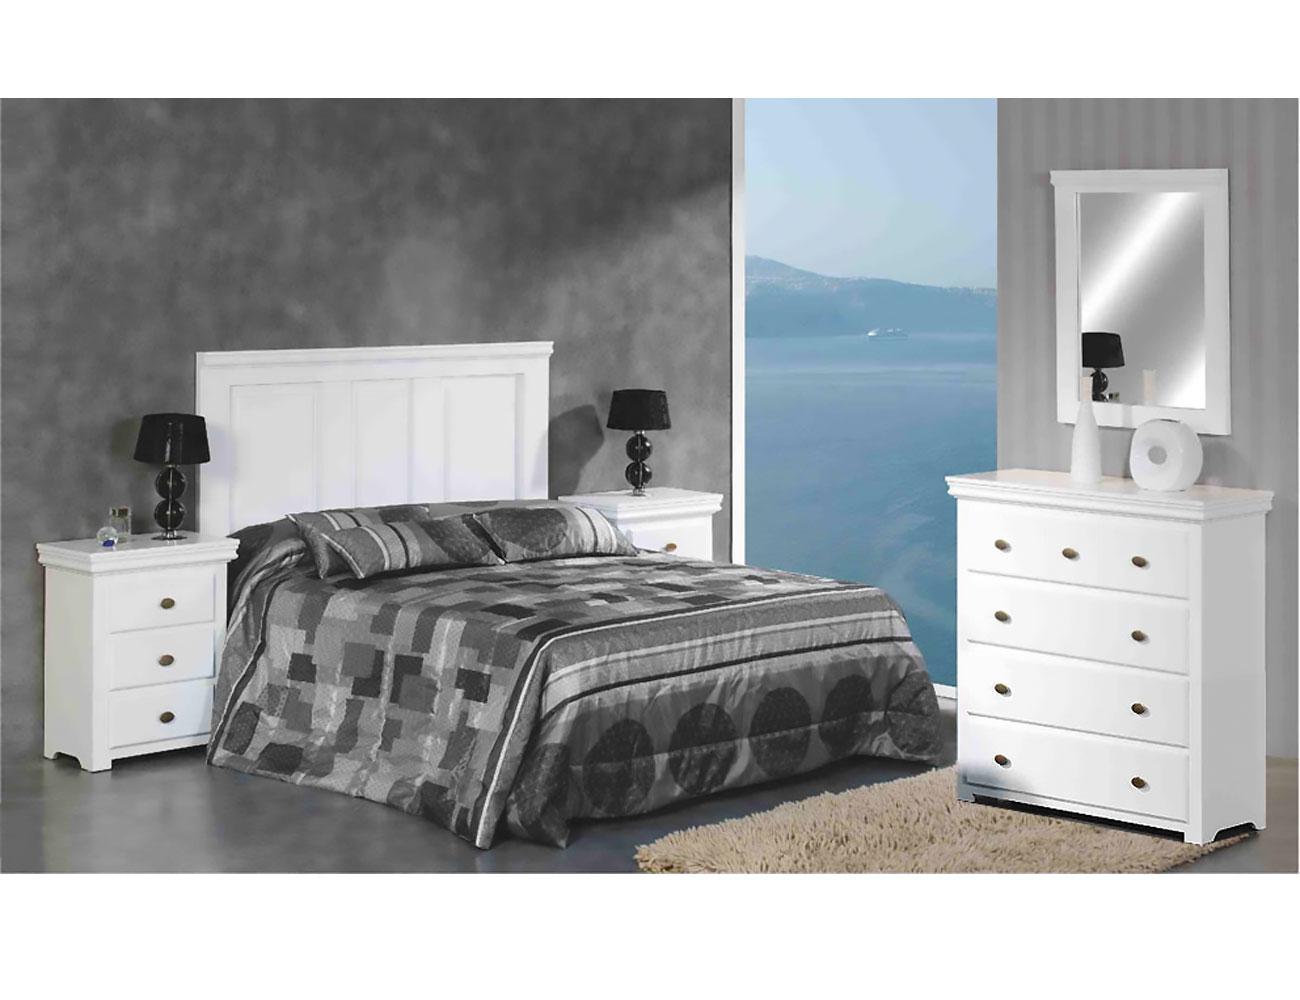 Dormitorio matrimonio comoda 5 c madera dm lacado blanco12